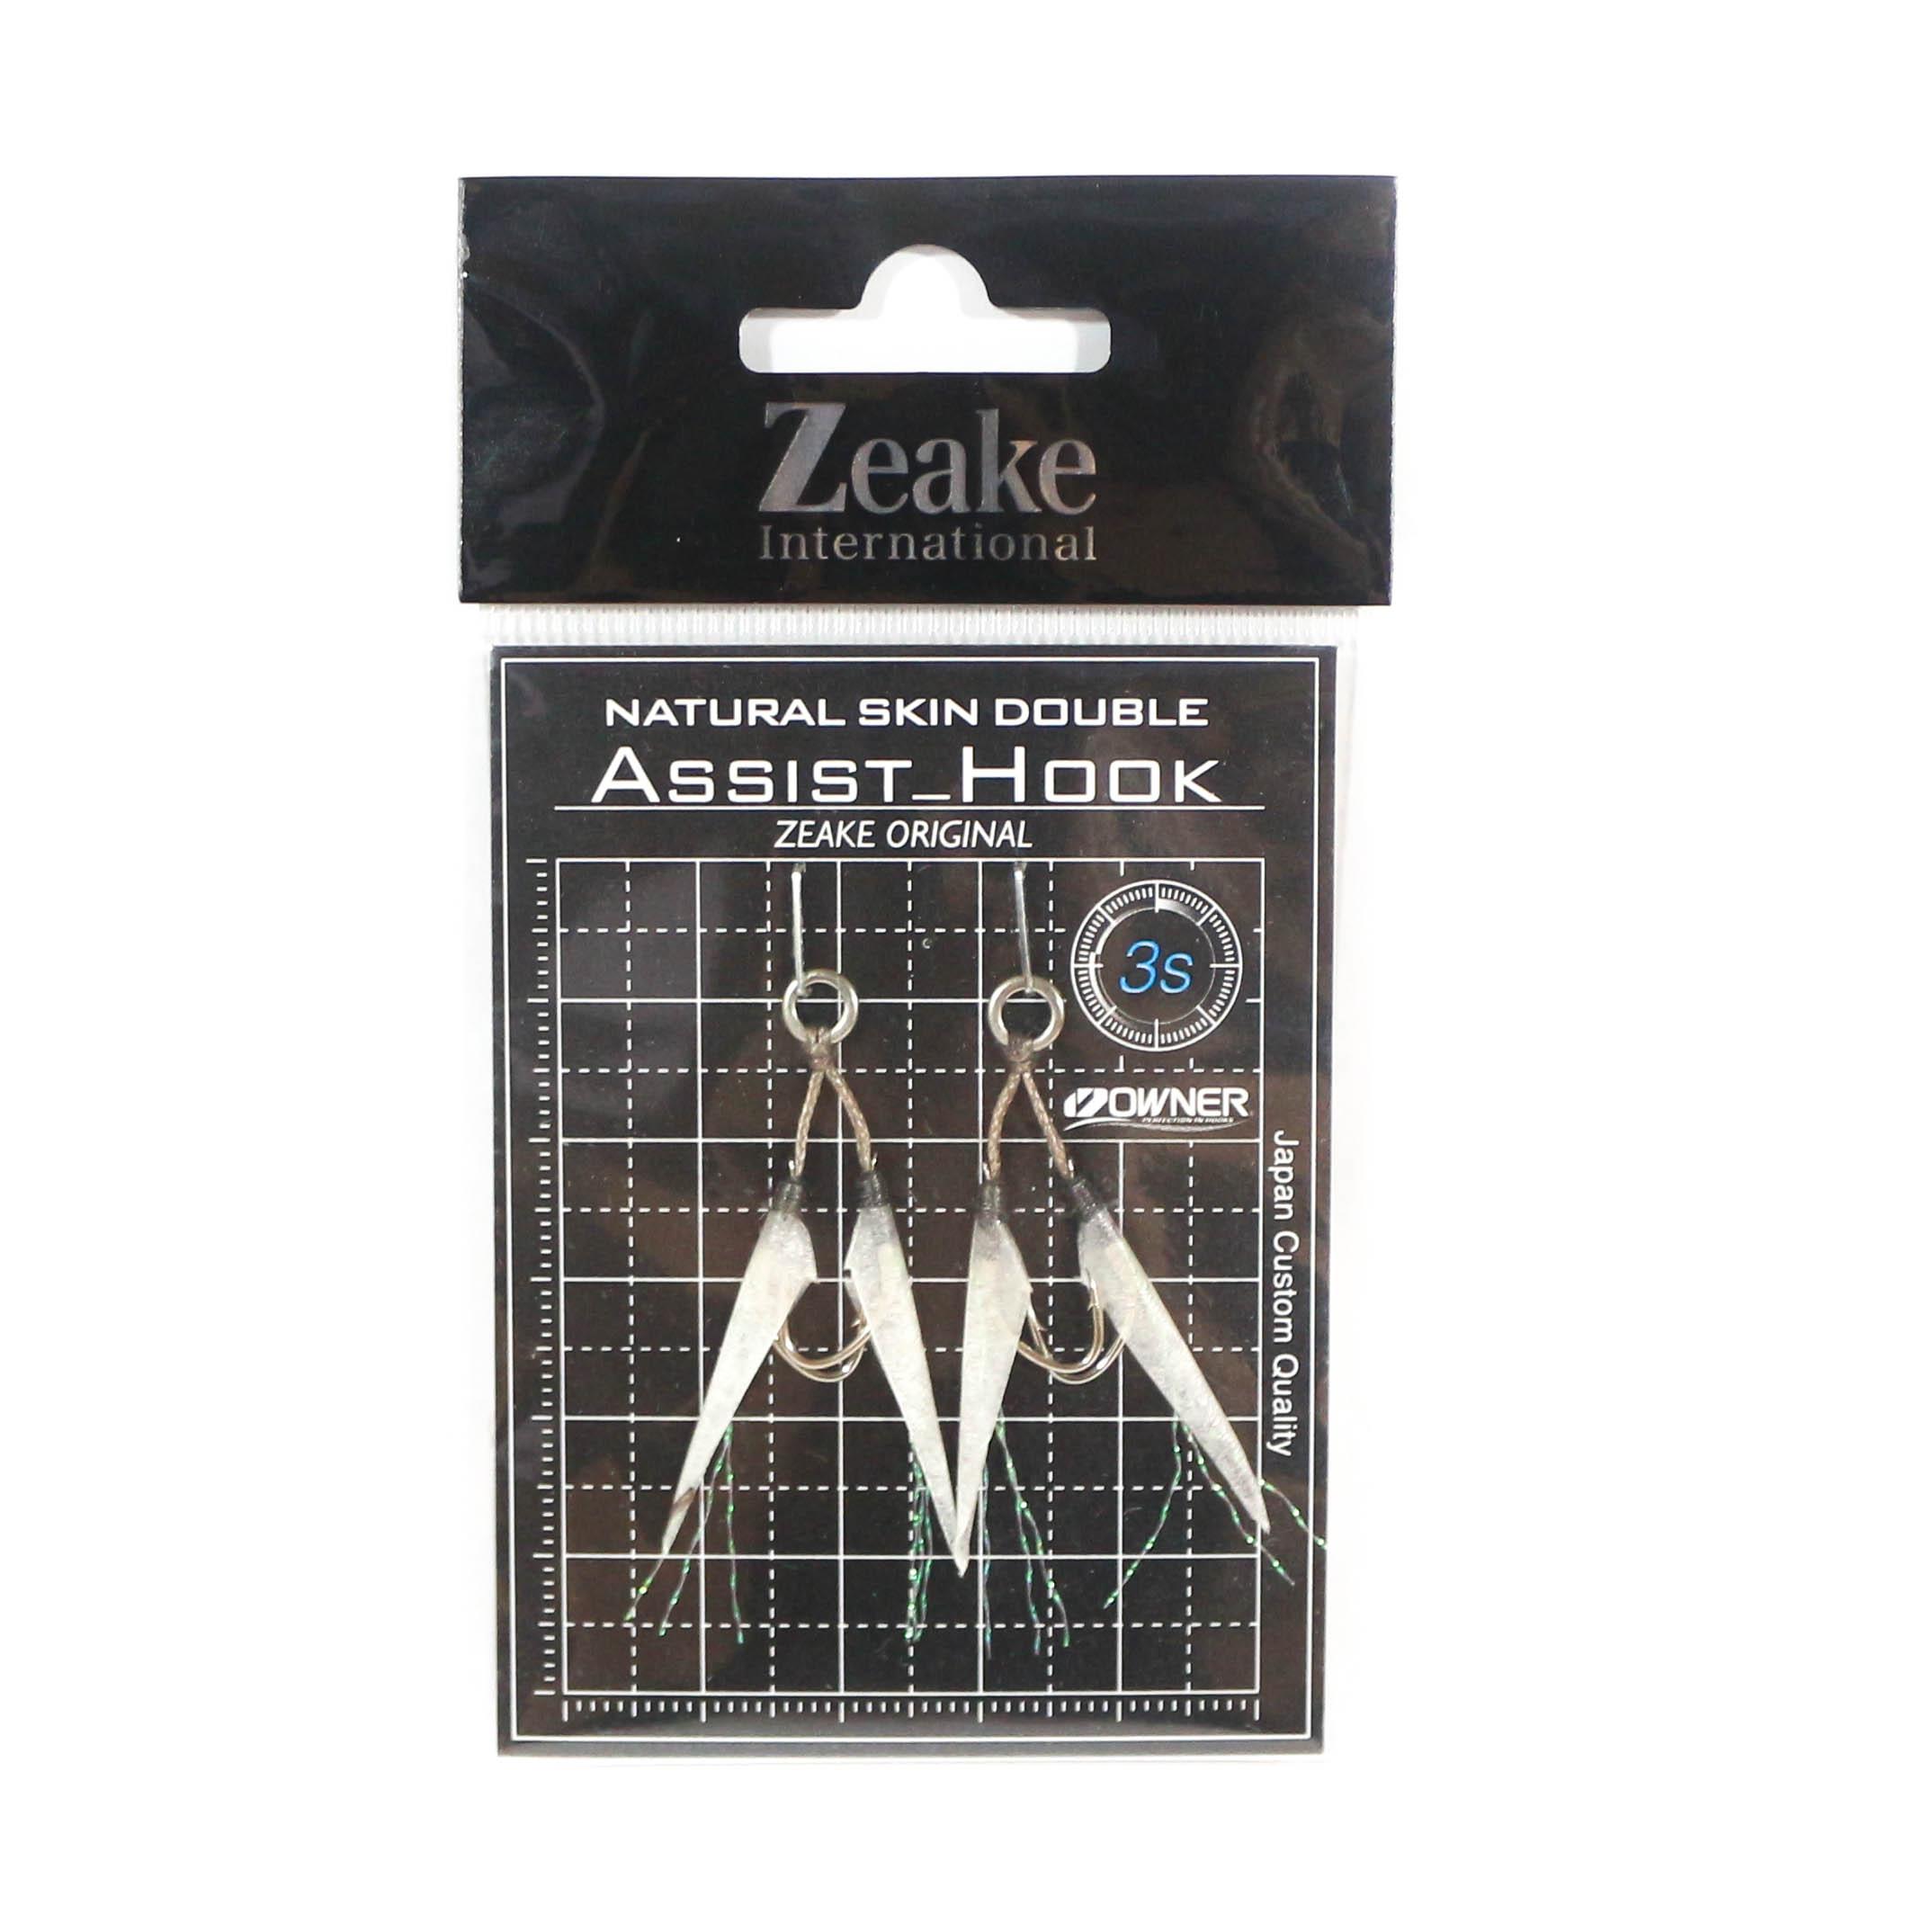 Zeake Assist Hook Double Fish Skin SLJ 2 per pack 3S (Size 8) (3032)